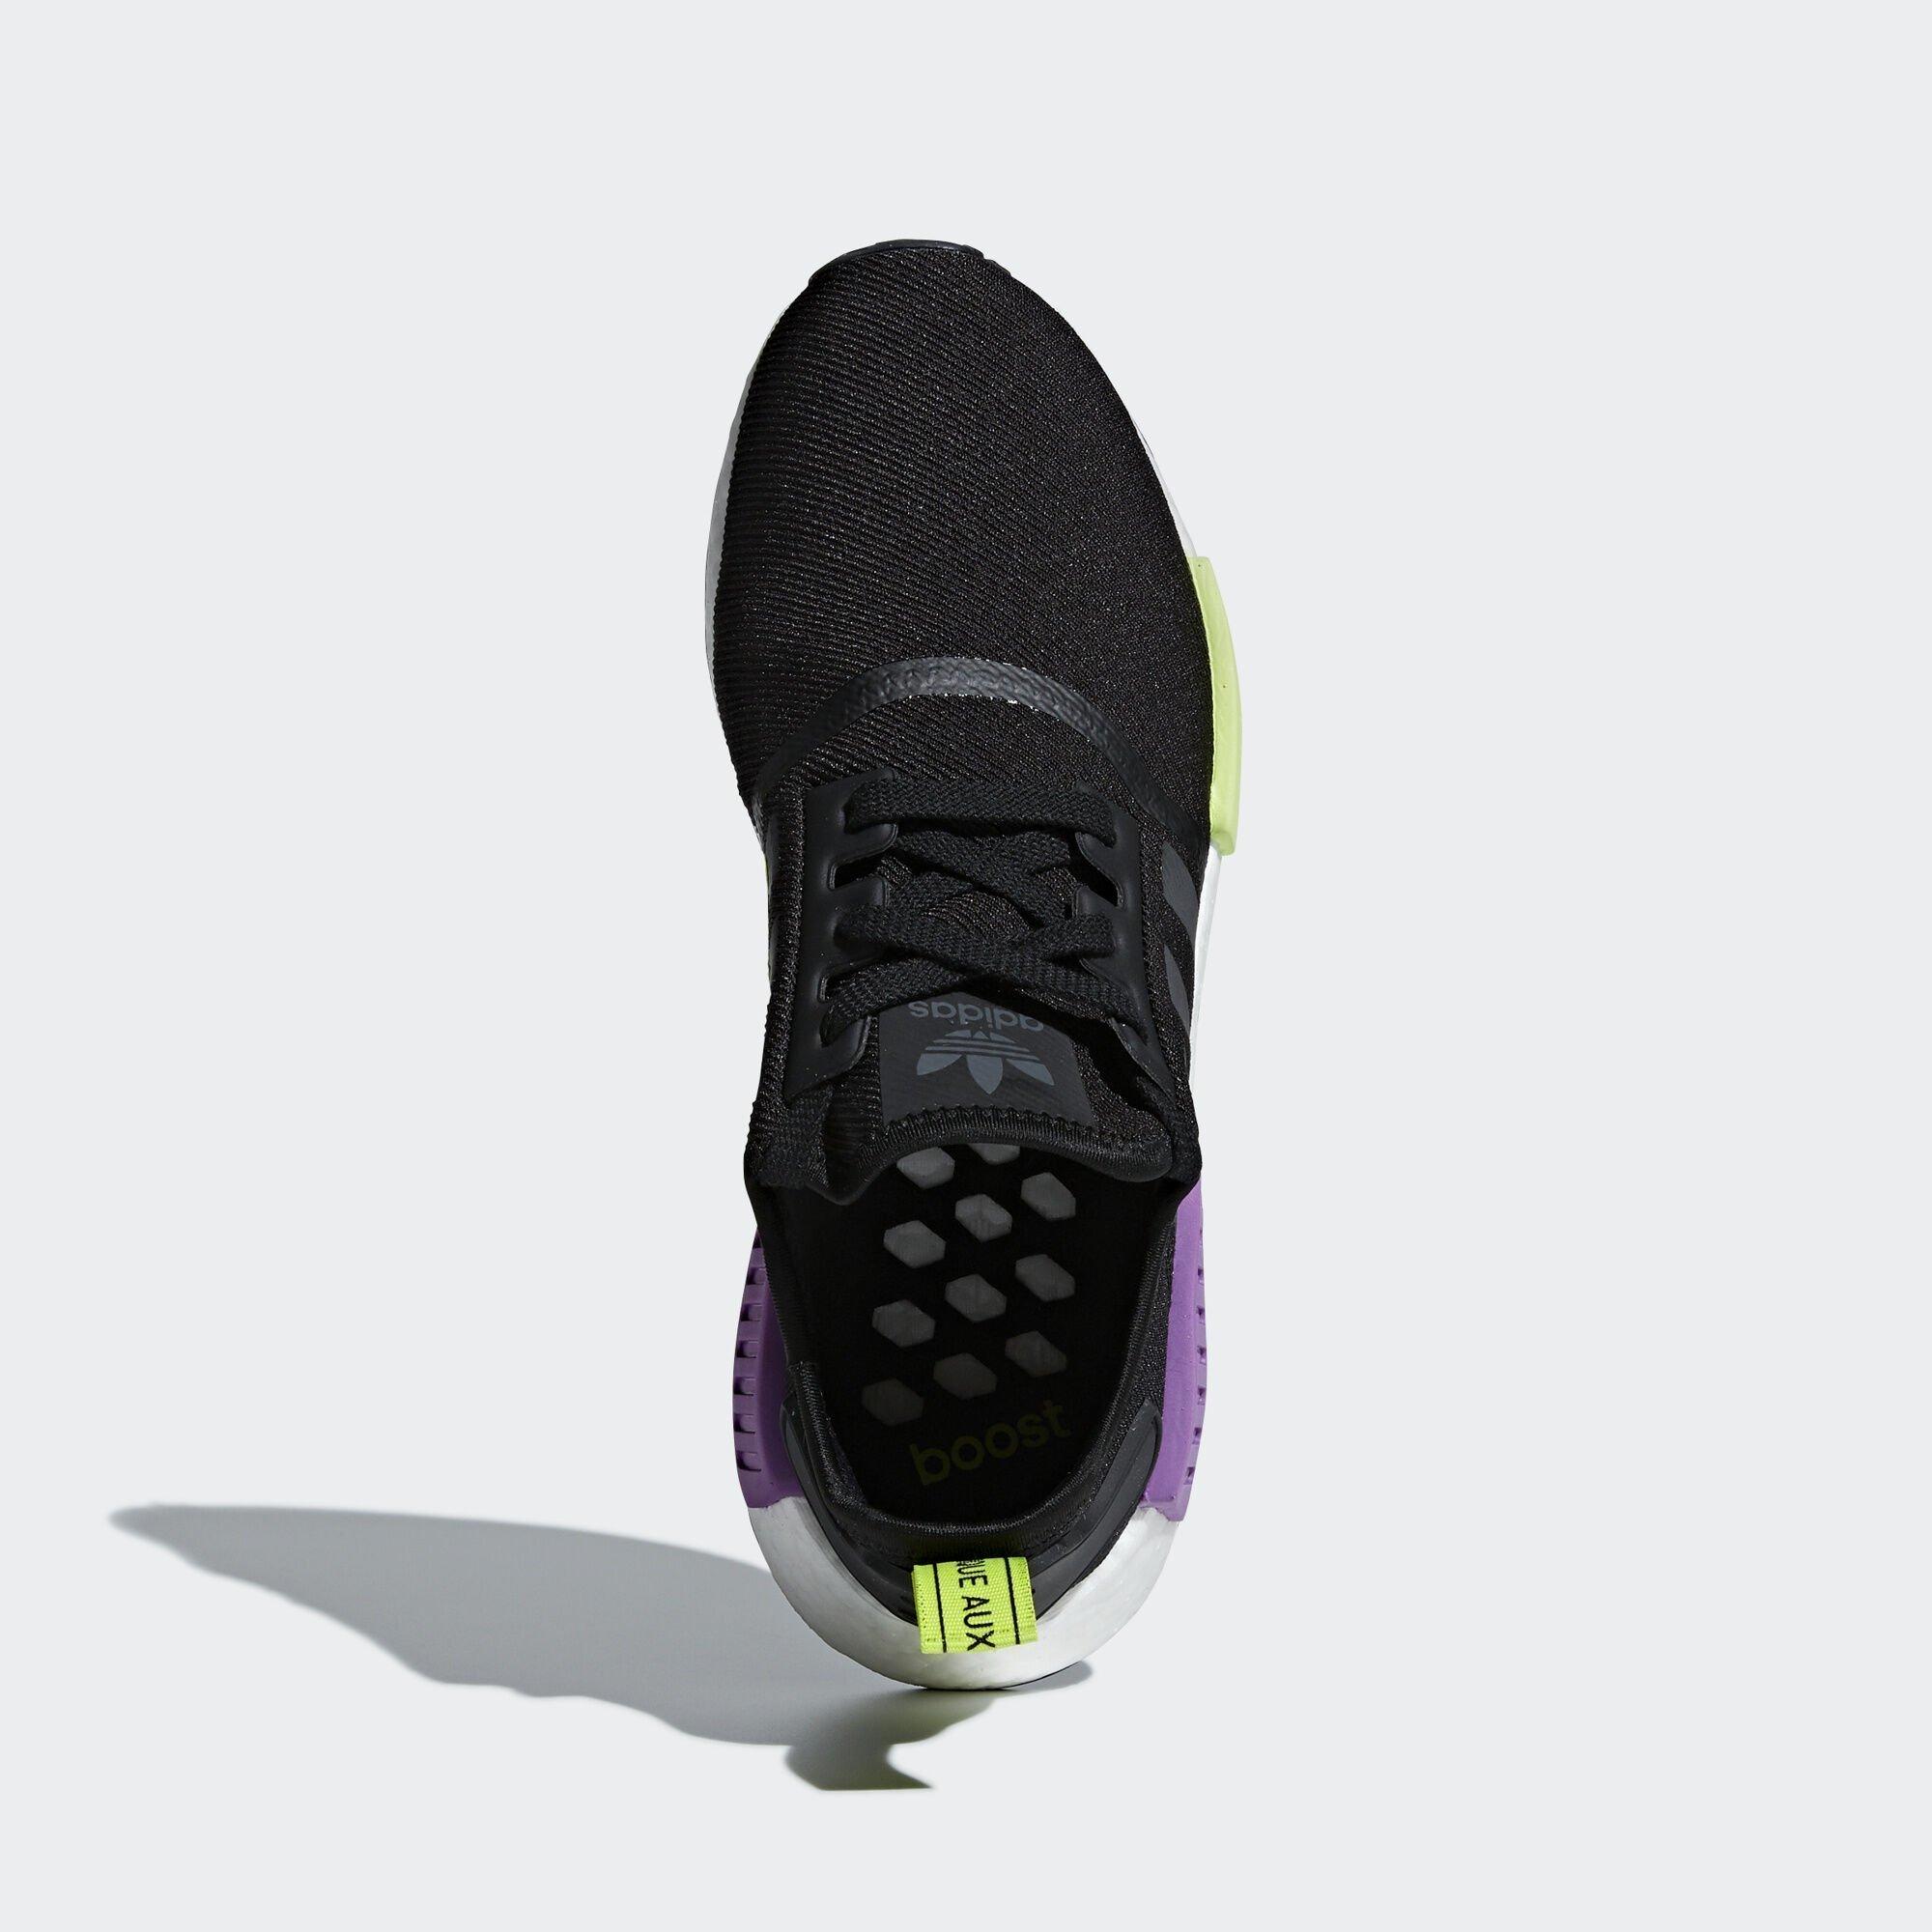 adidas NMD R1 Core Black Shock Purple (D96627)